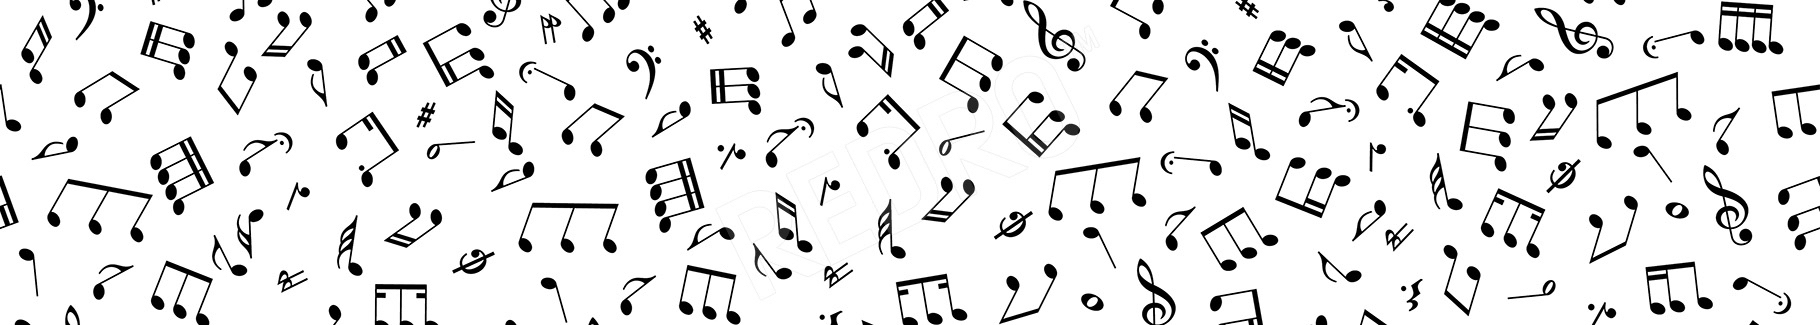 Fototapeta muzyka do pokoju nastolatka